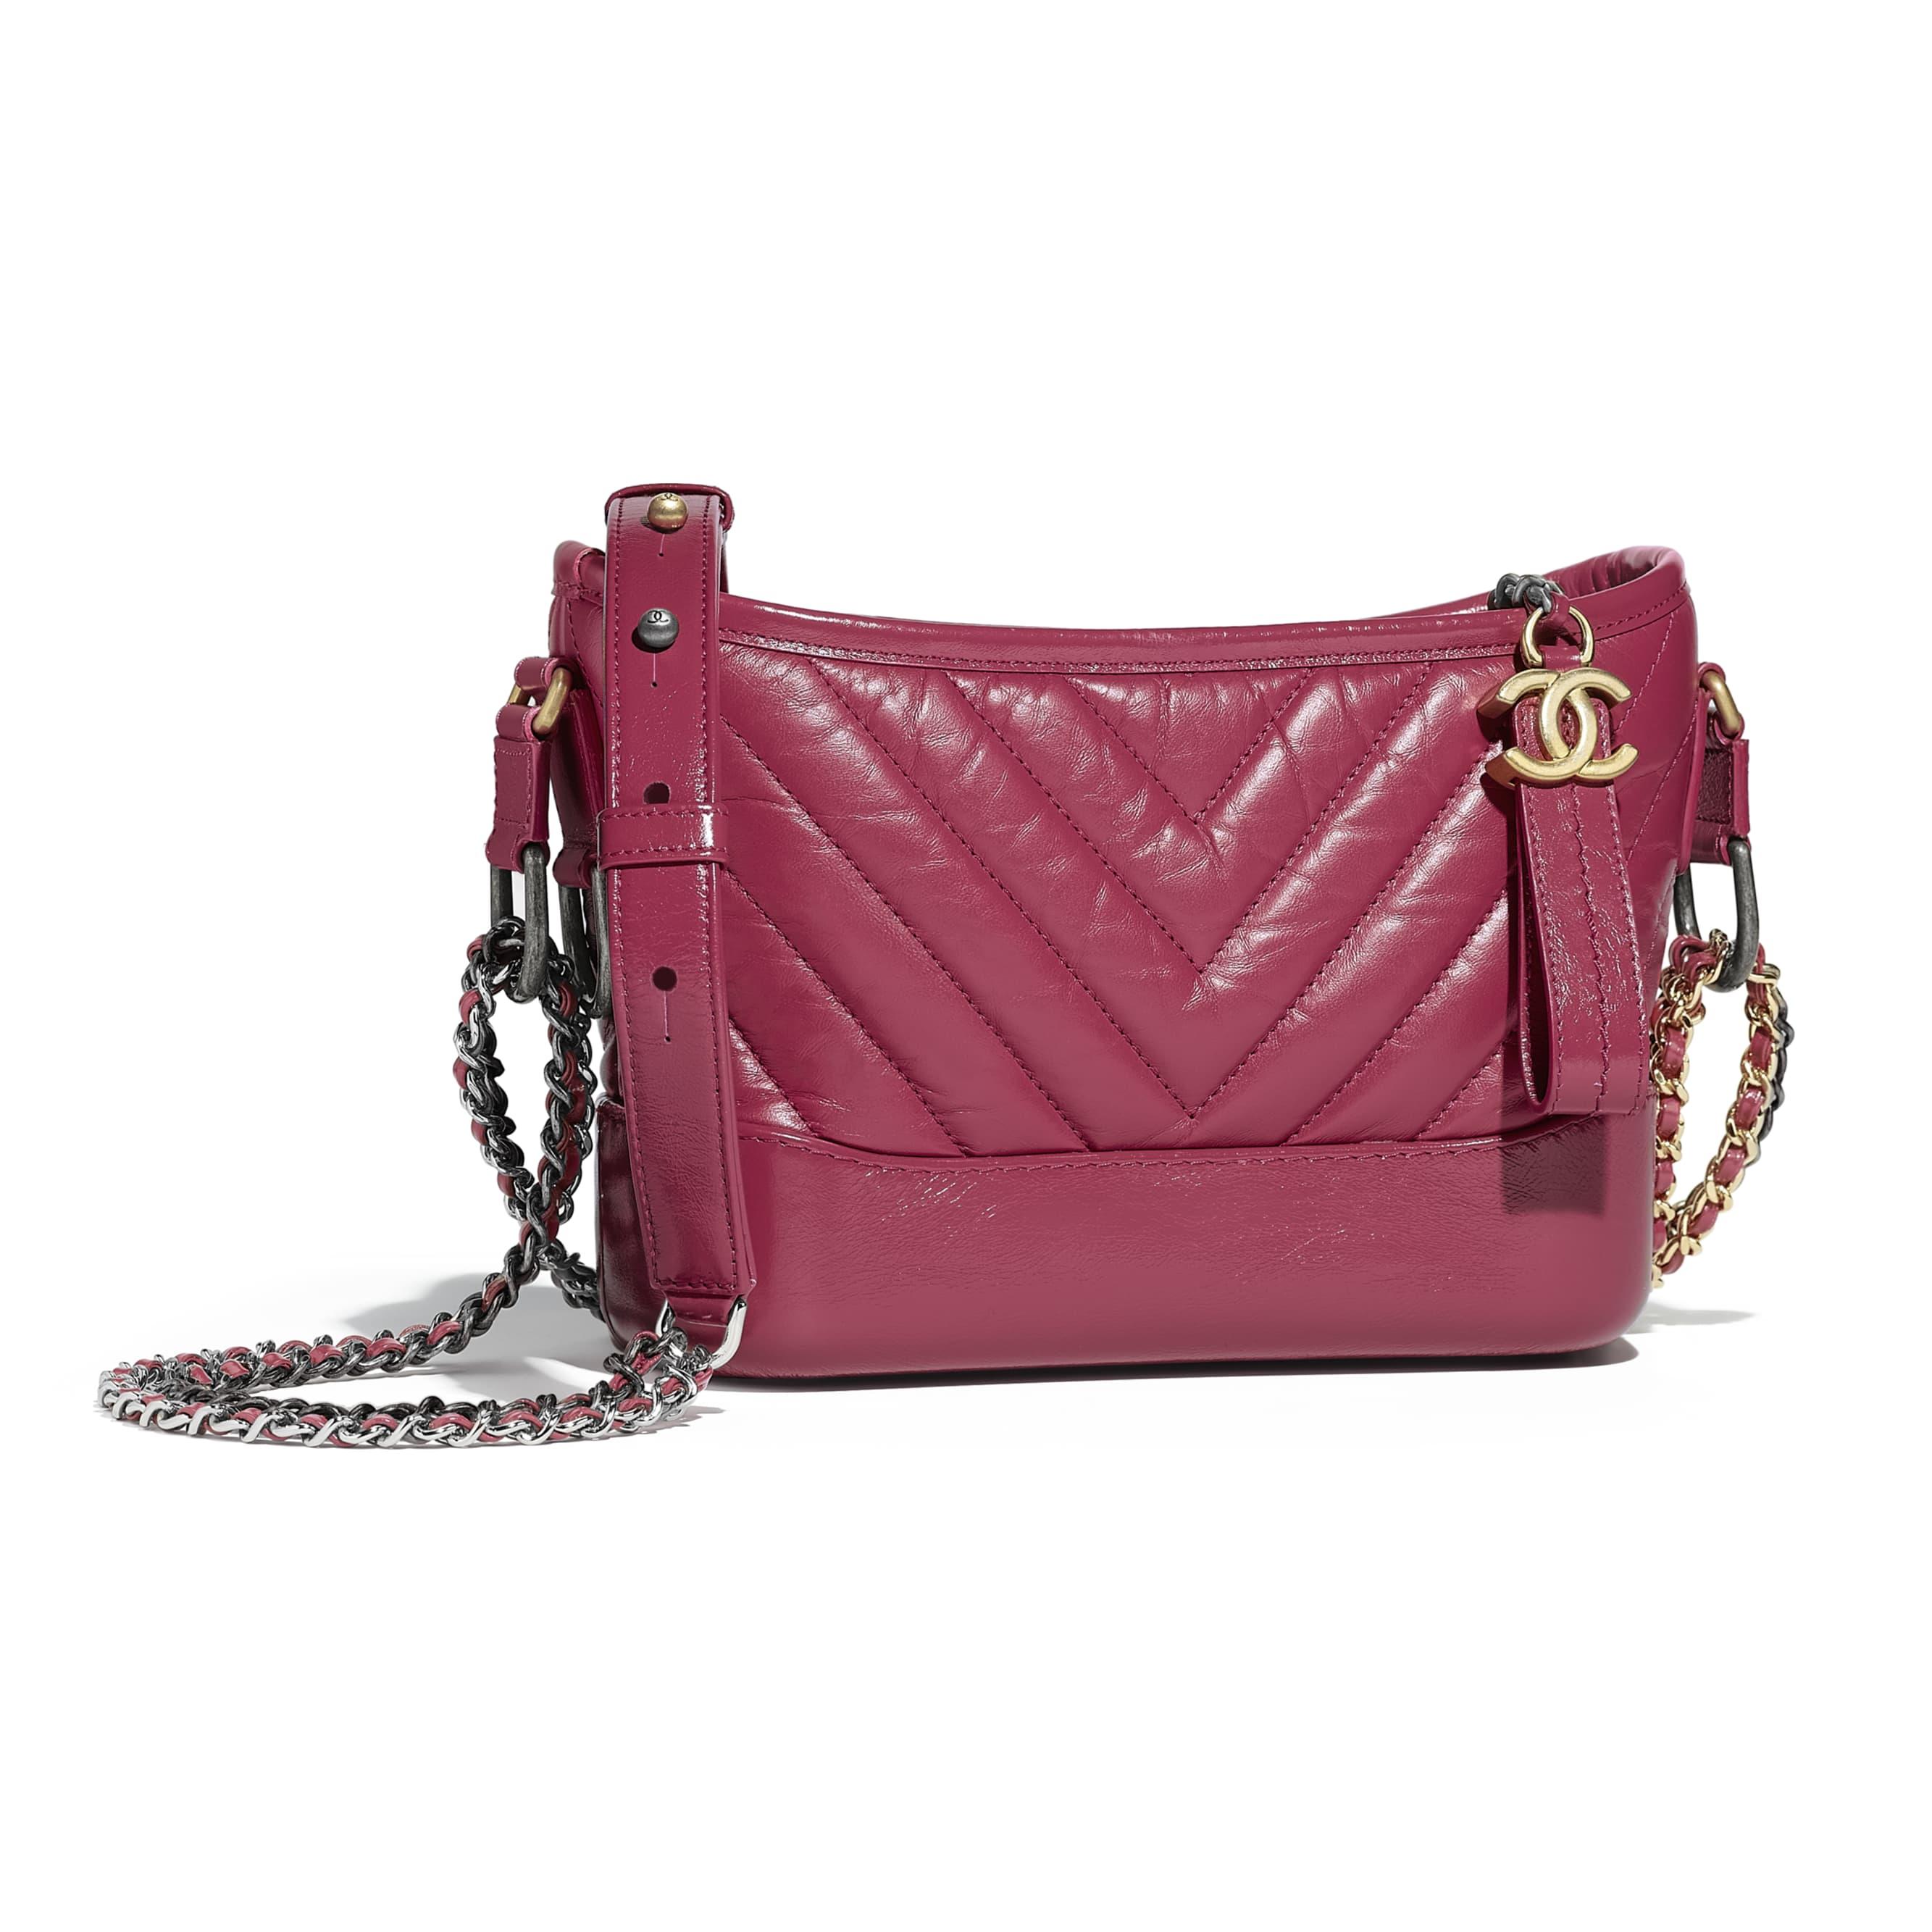 Chanels gabrielle small hobo bag pink aged calfskin smooth calfskin silver  jpg 2667x2667 Pink hobo 8c62c832b2